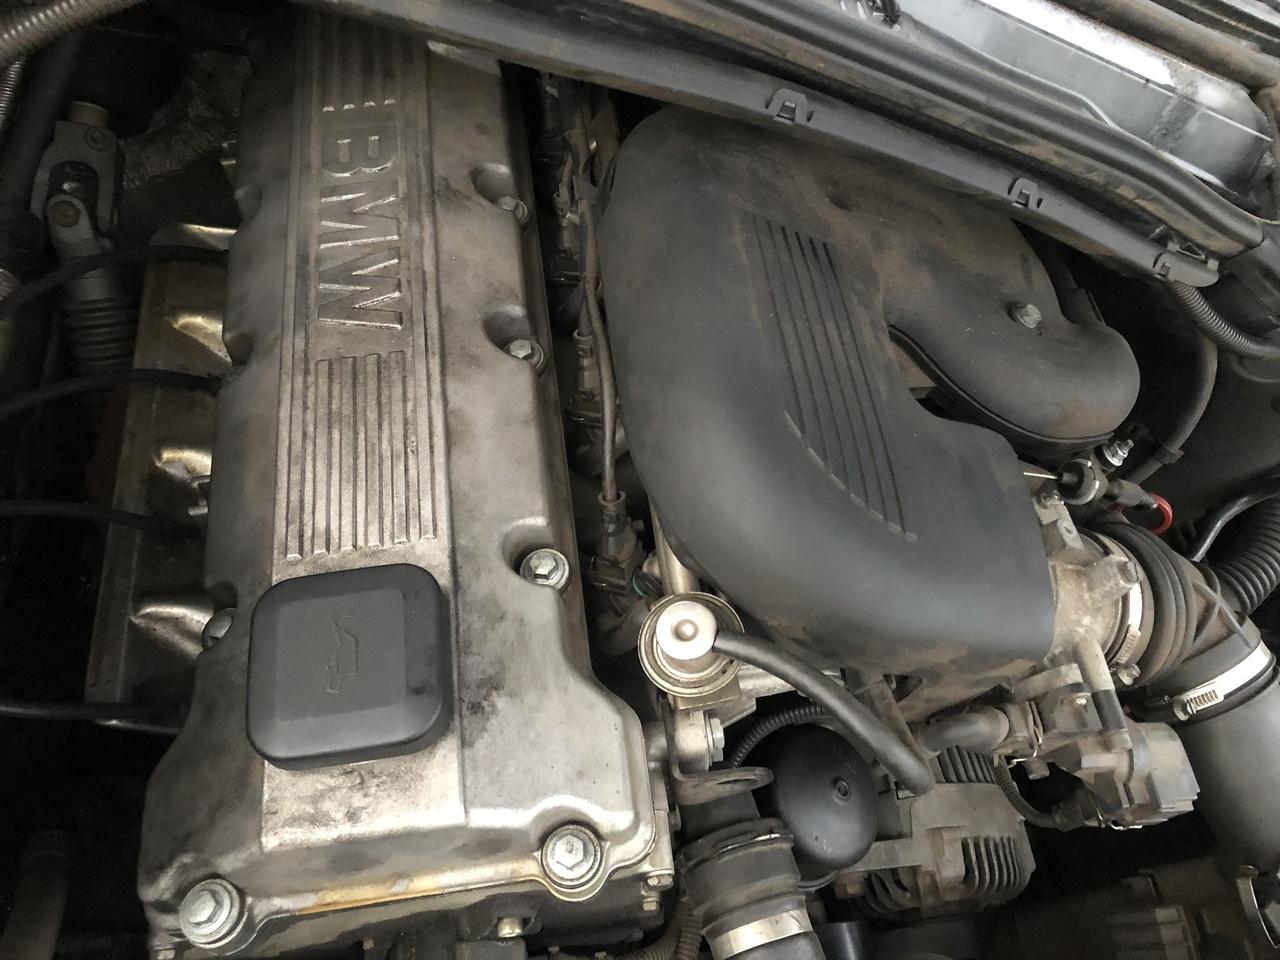 BMW 318I E46 M43 1998-2000 USED GM TWIN SUMP TYPE AUTO TRANSMISSION